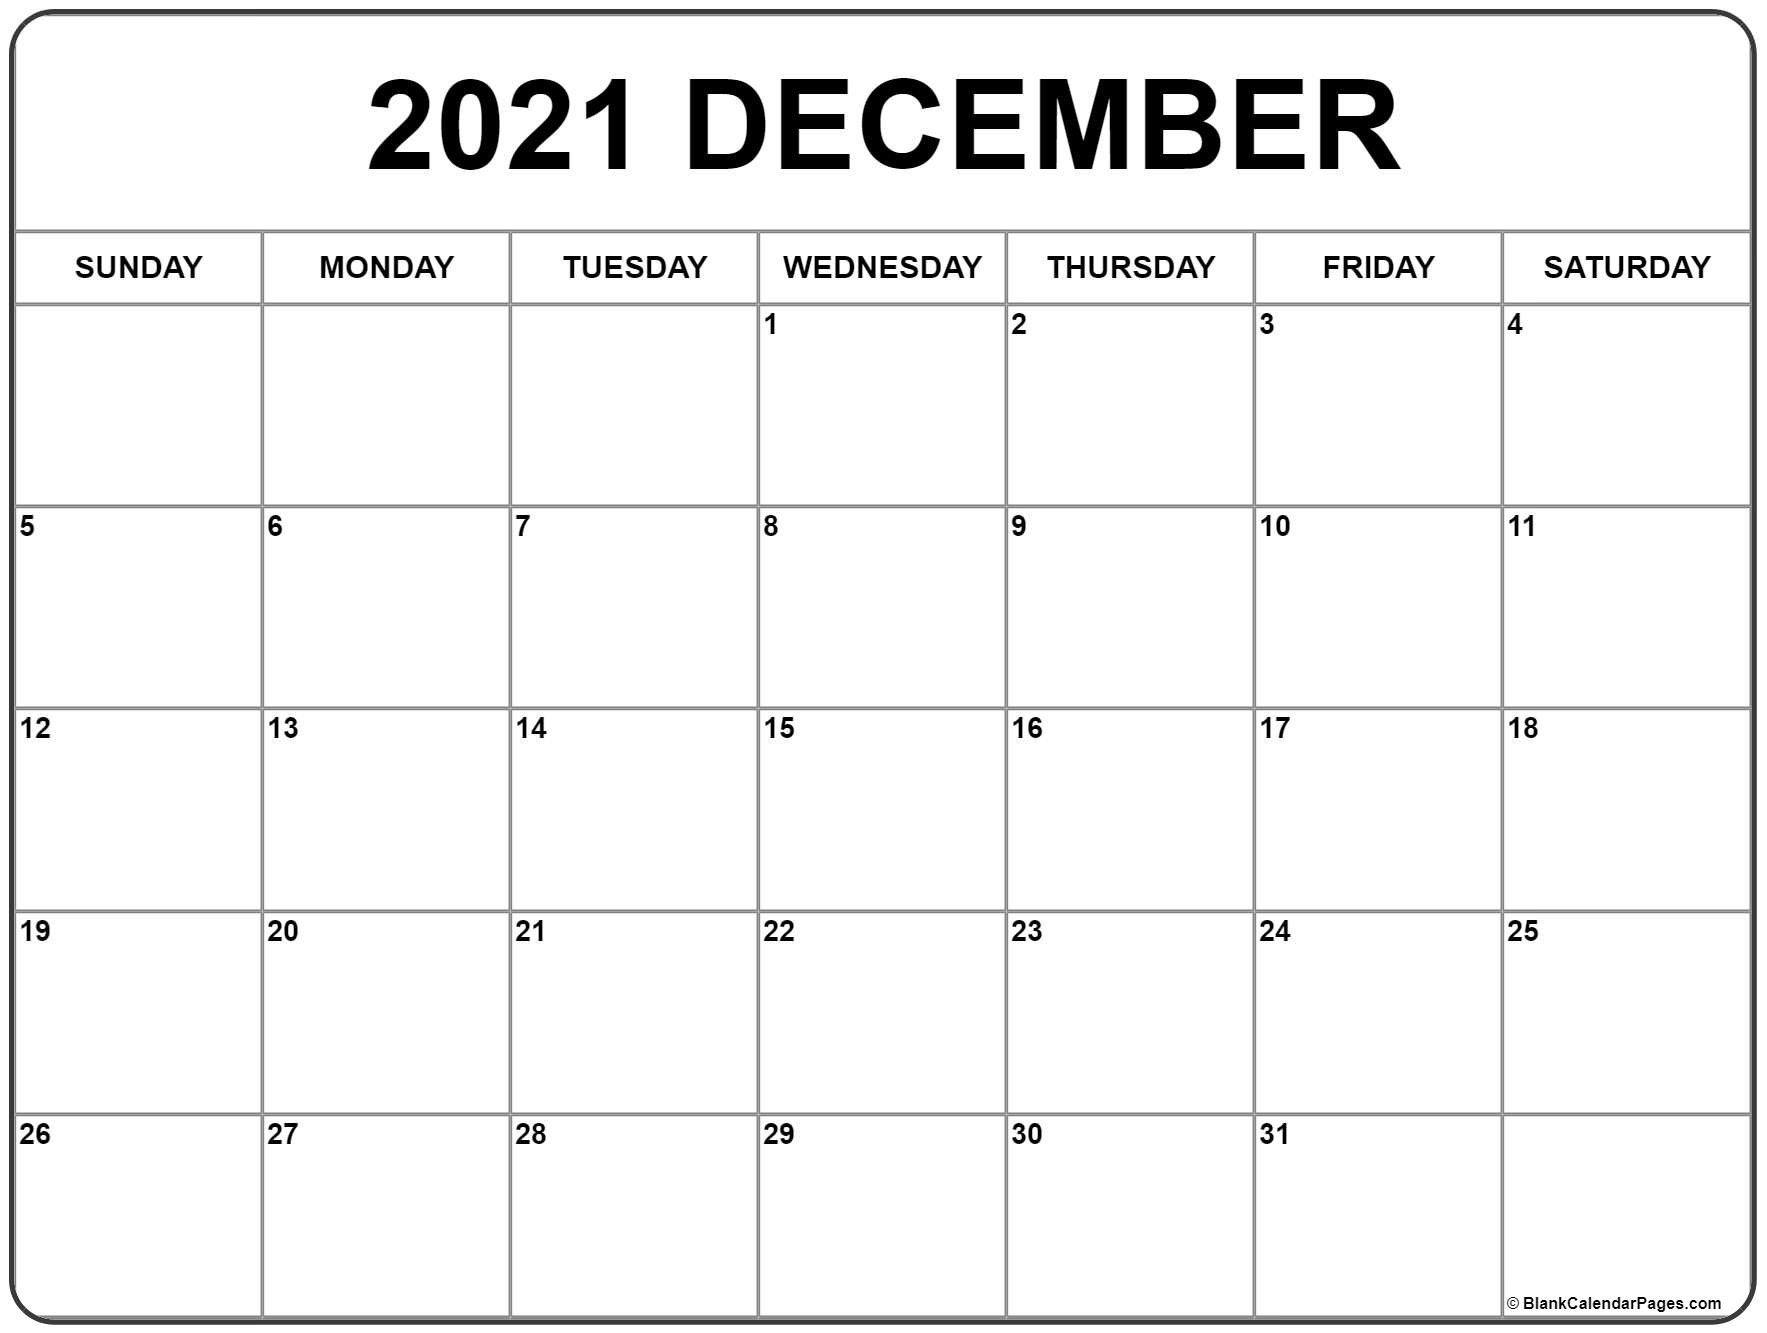 Month Of December 2021 Calendar Cute December 2021 Calendar in 2020 | Monthly calendar printable